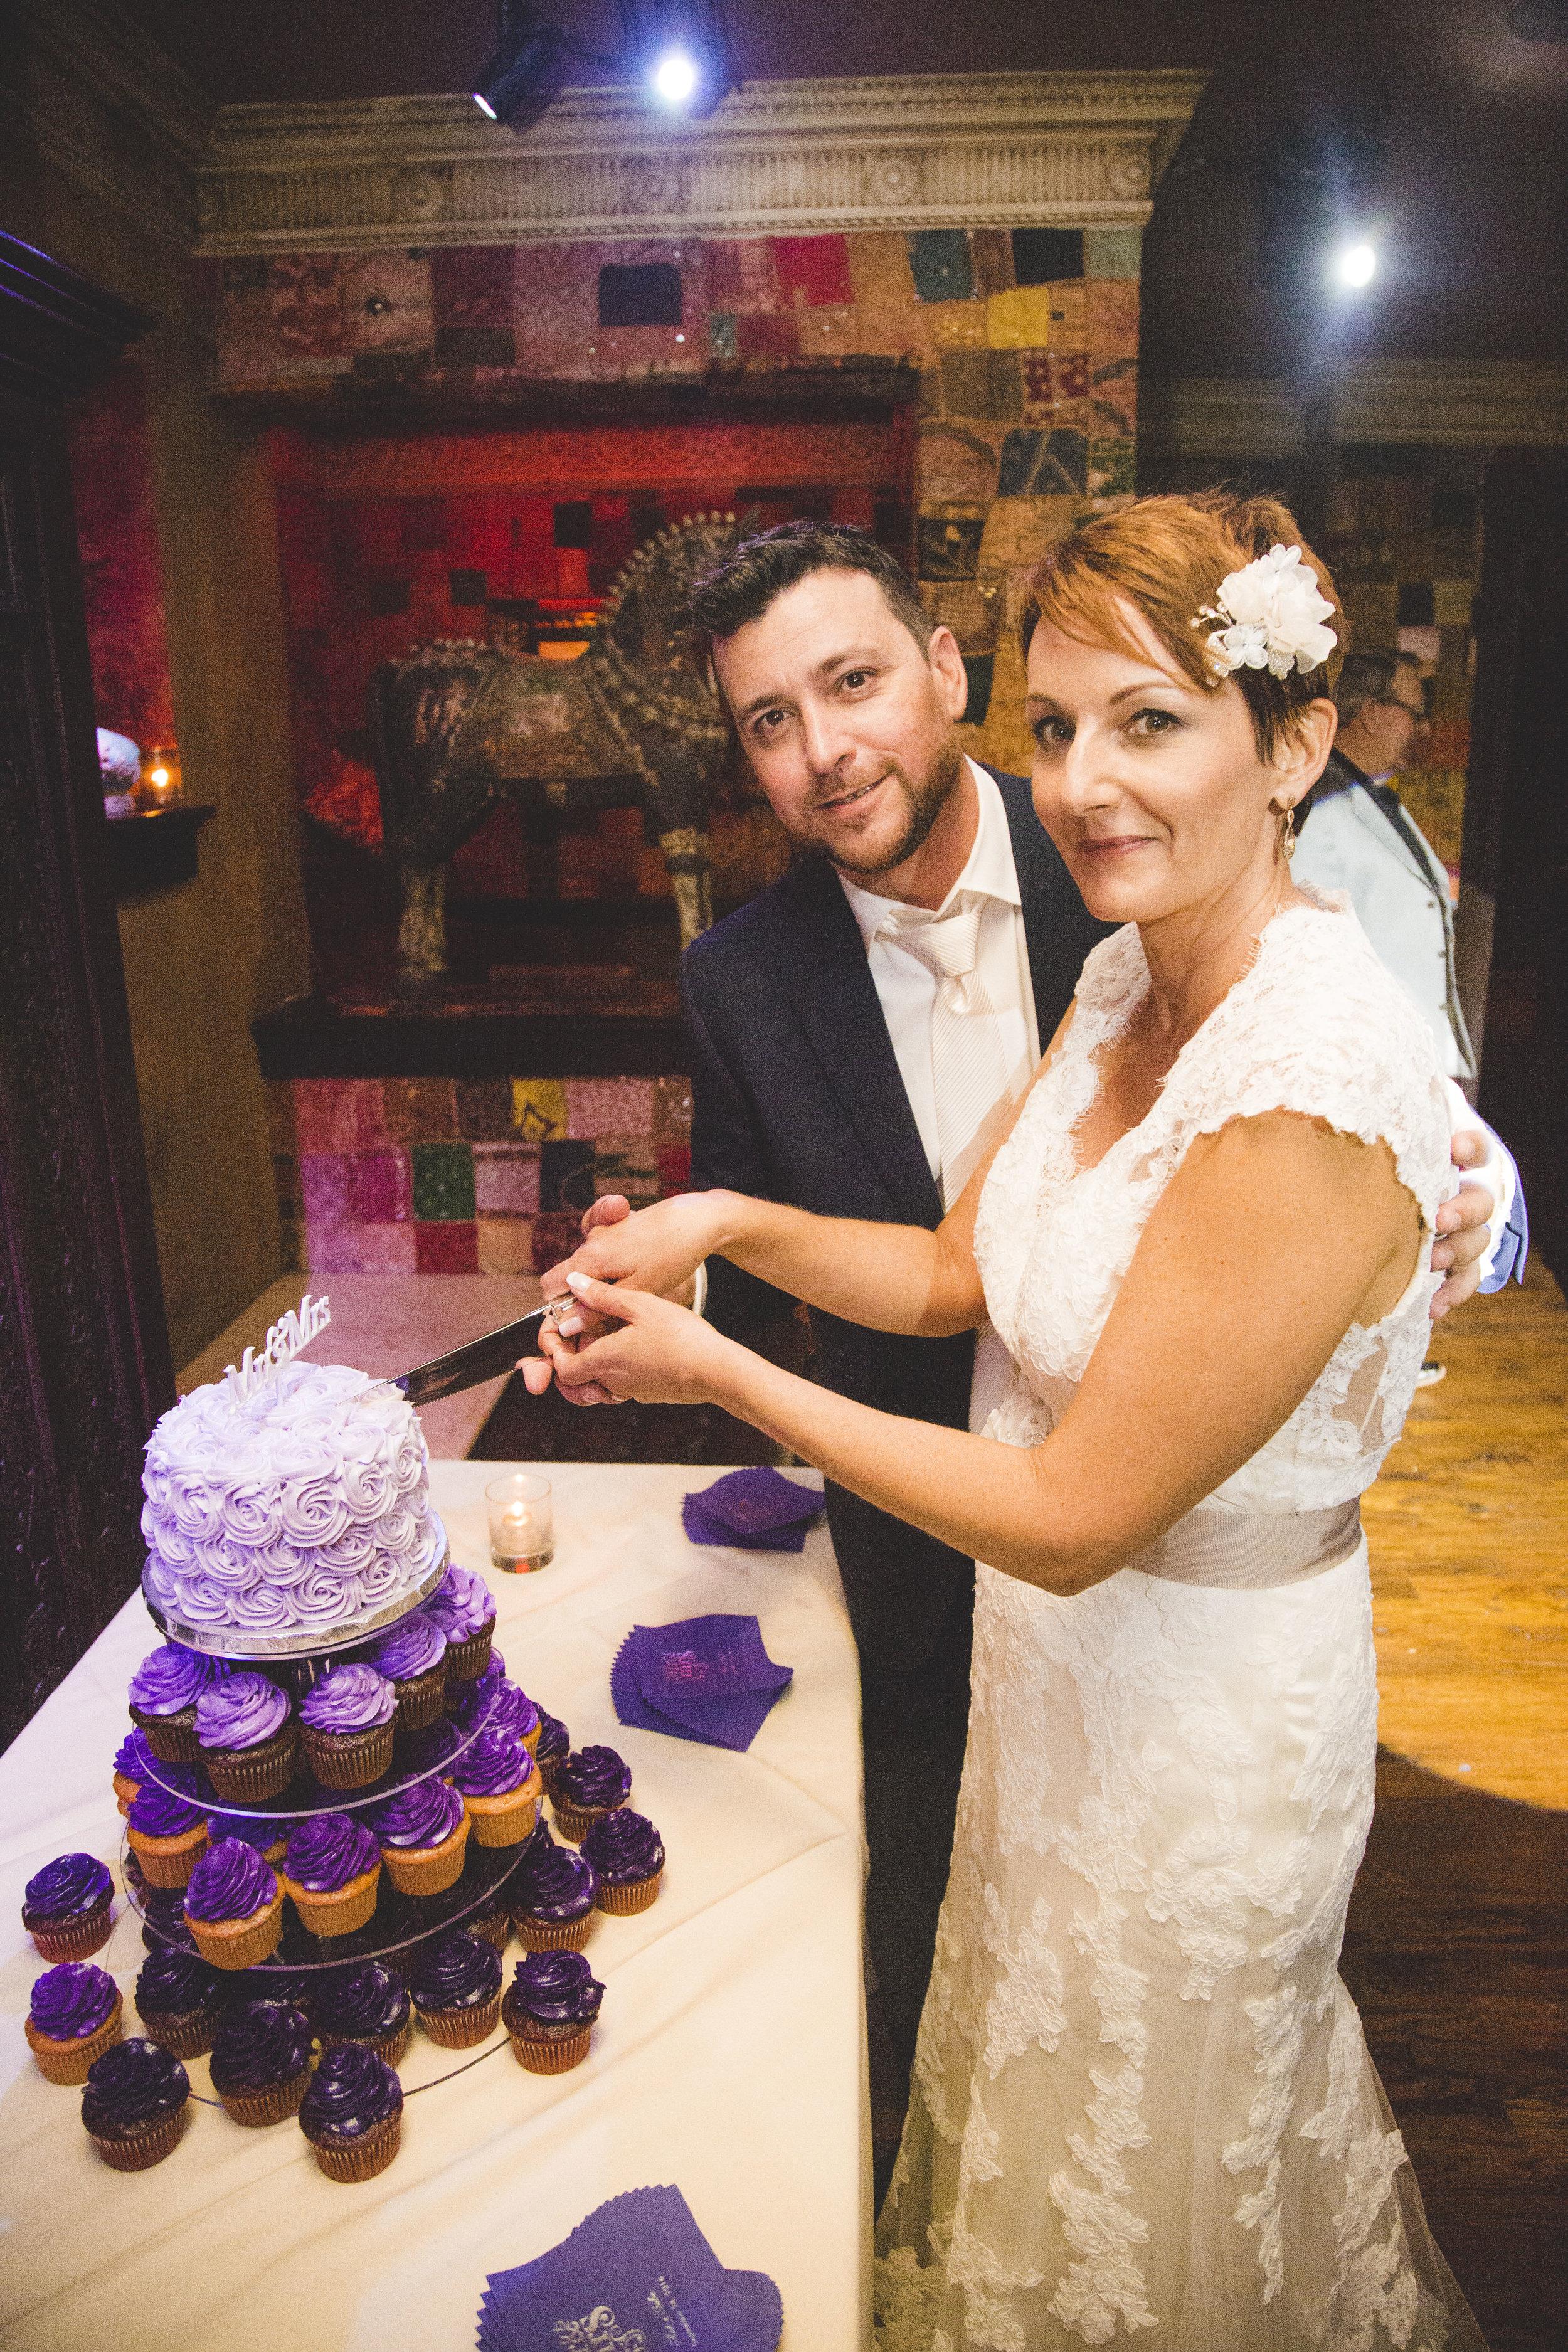 ATGI_Kat and Gabe Wedding 2016_2S8A6087.jpg